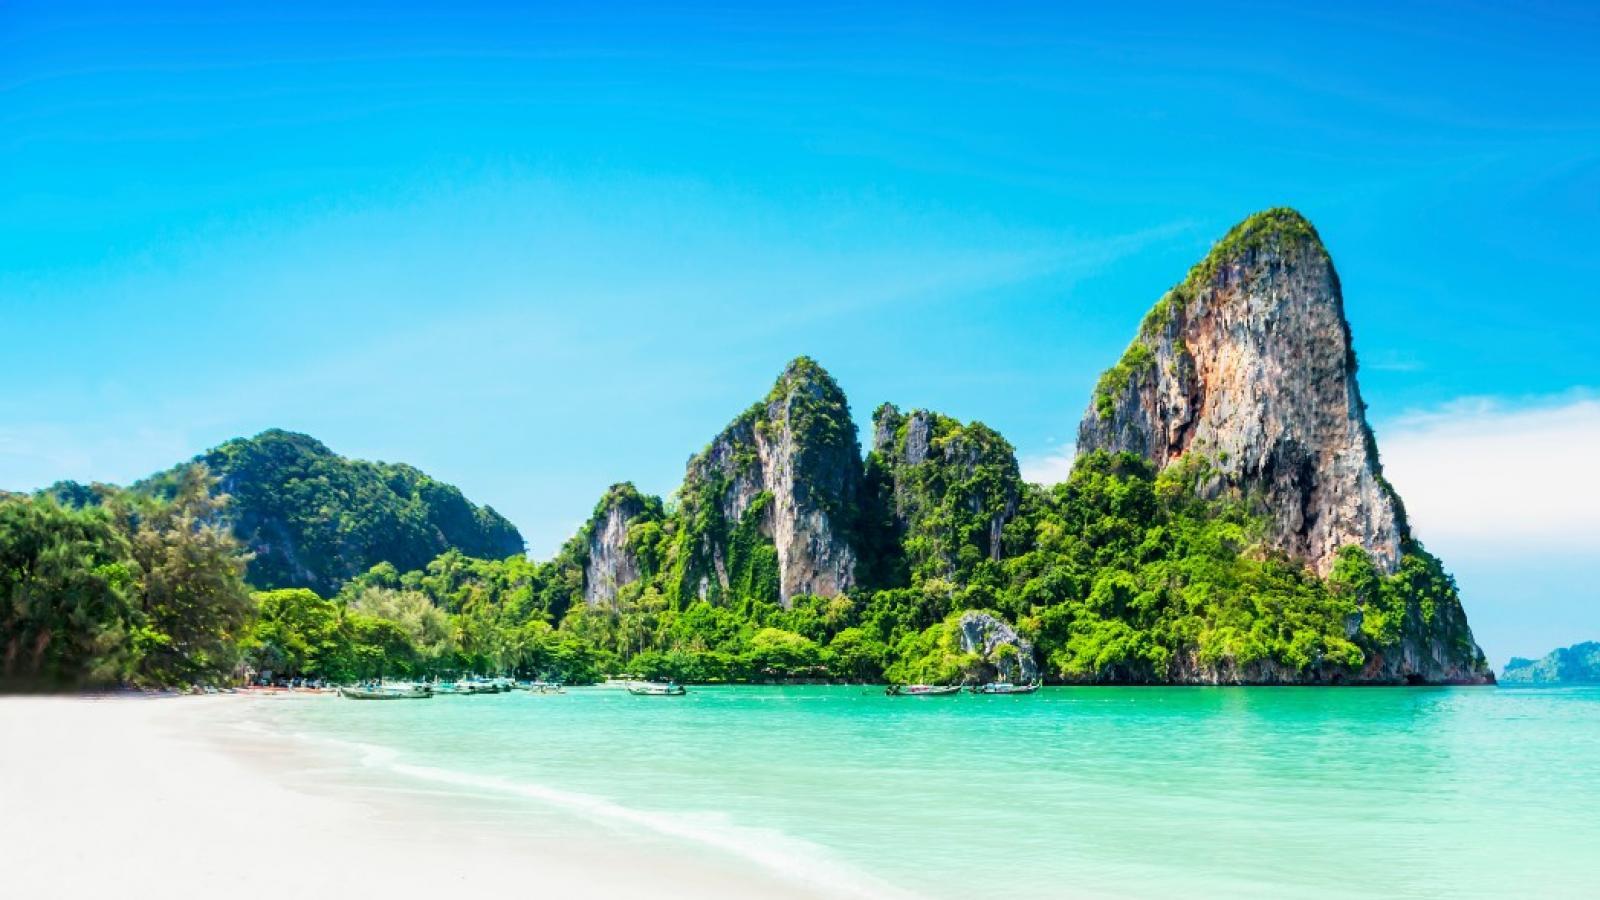 Qatar Airways to resume flights to Phuket, Thailand from July 1